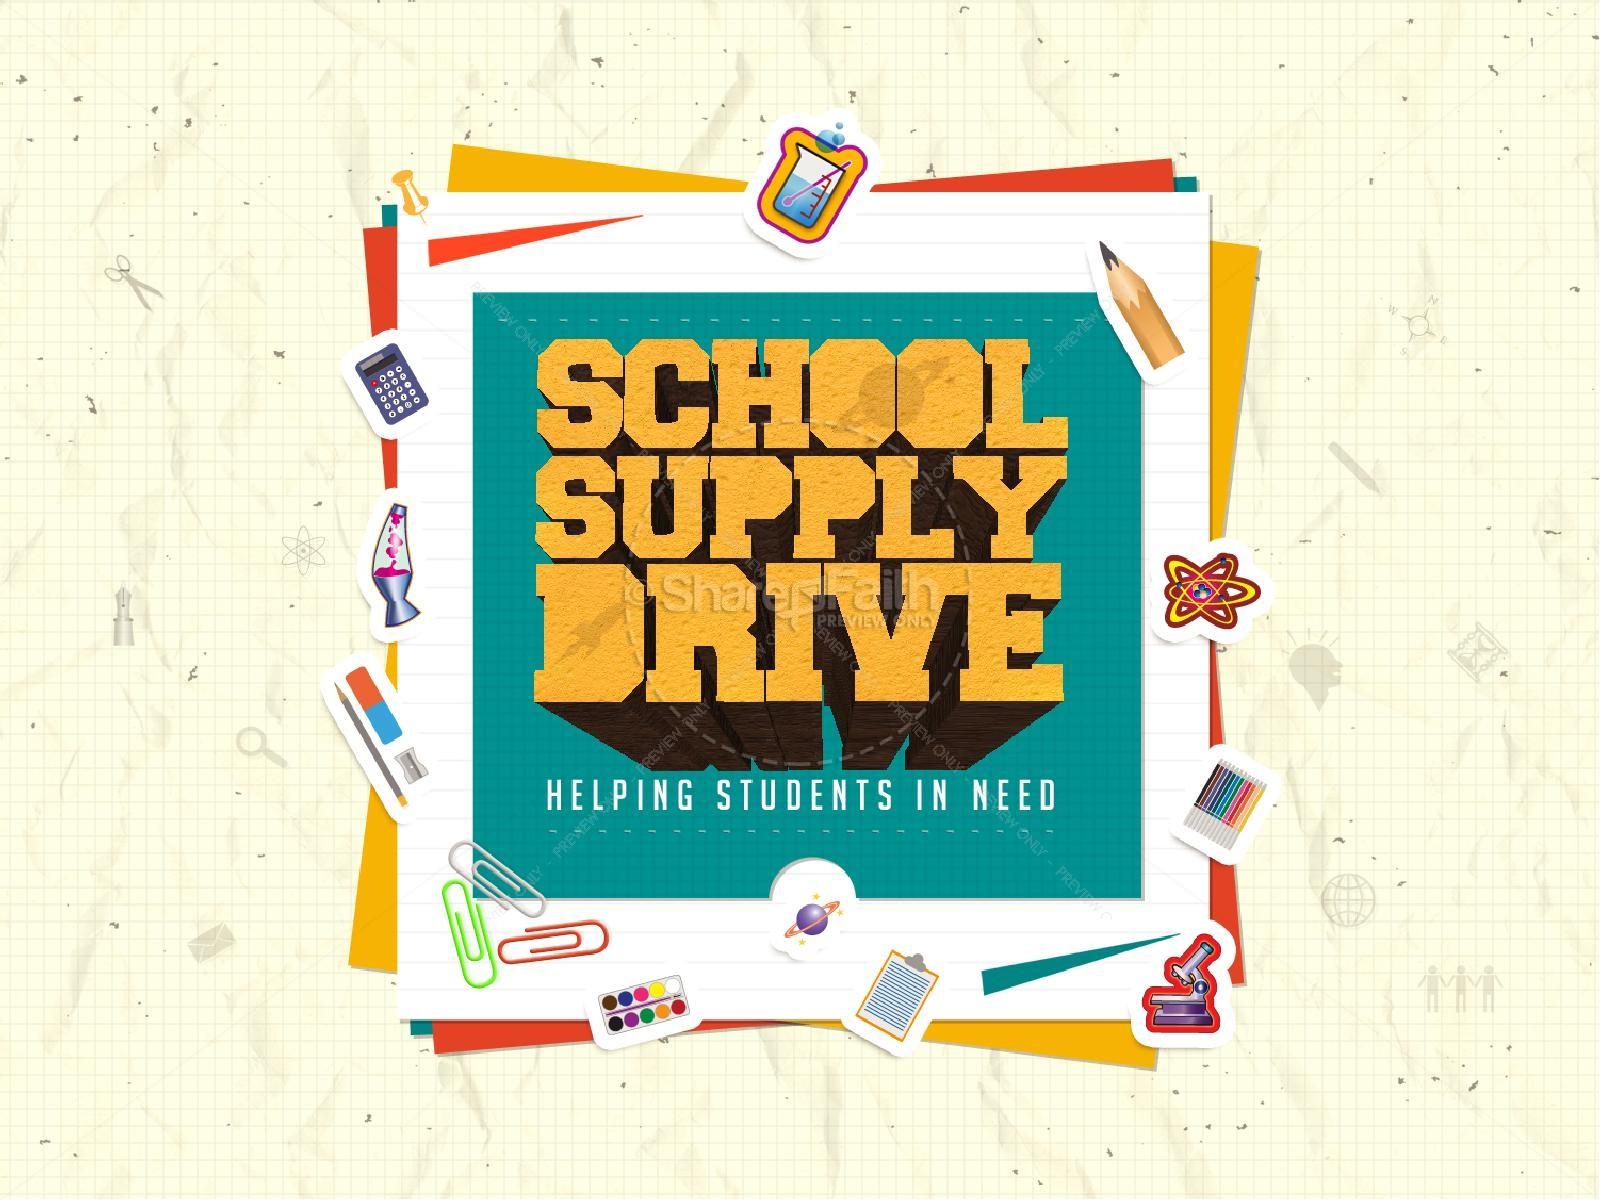 School supplies drive clipart clip art royalty free download School supply drive clipart 4 » Clipart Station clip art royalty free download